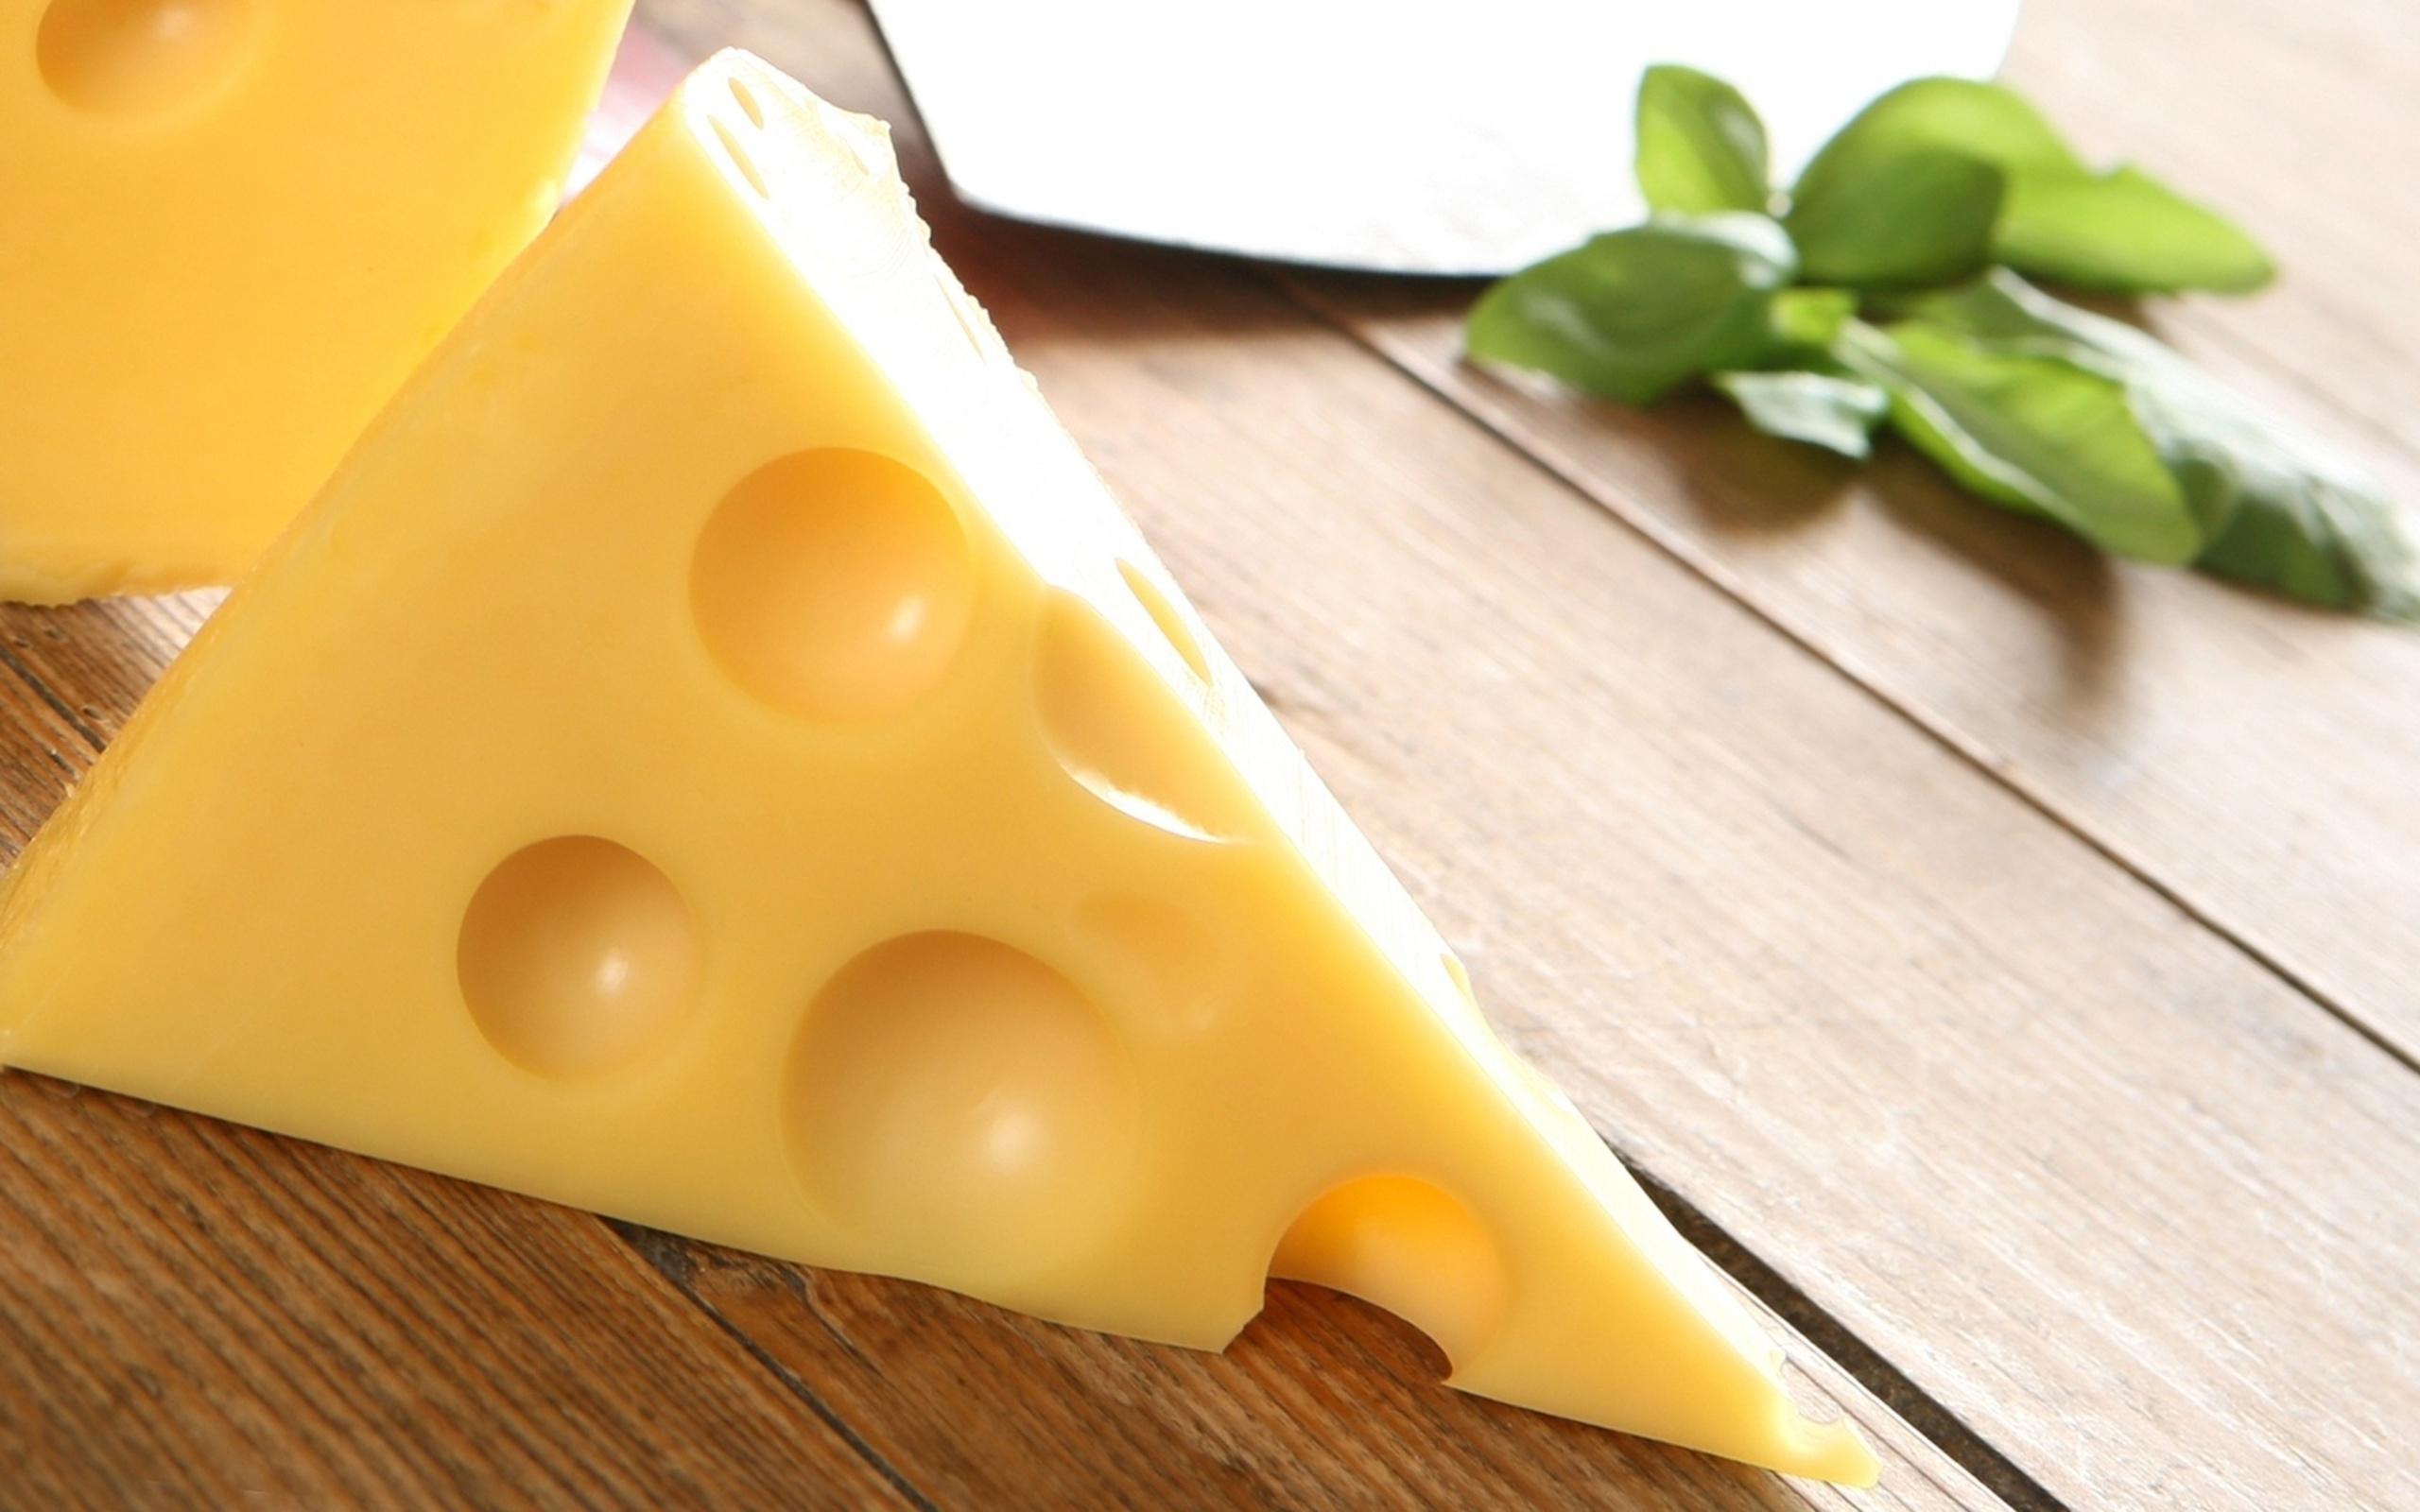 Wallpaper Cheese Food Piece 2560x1600 1028348 Hd